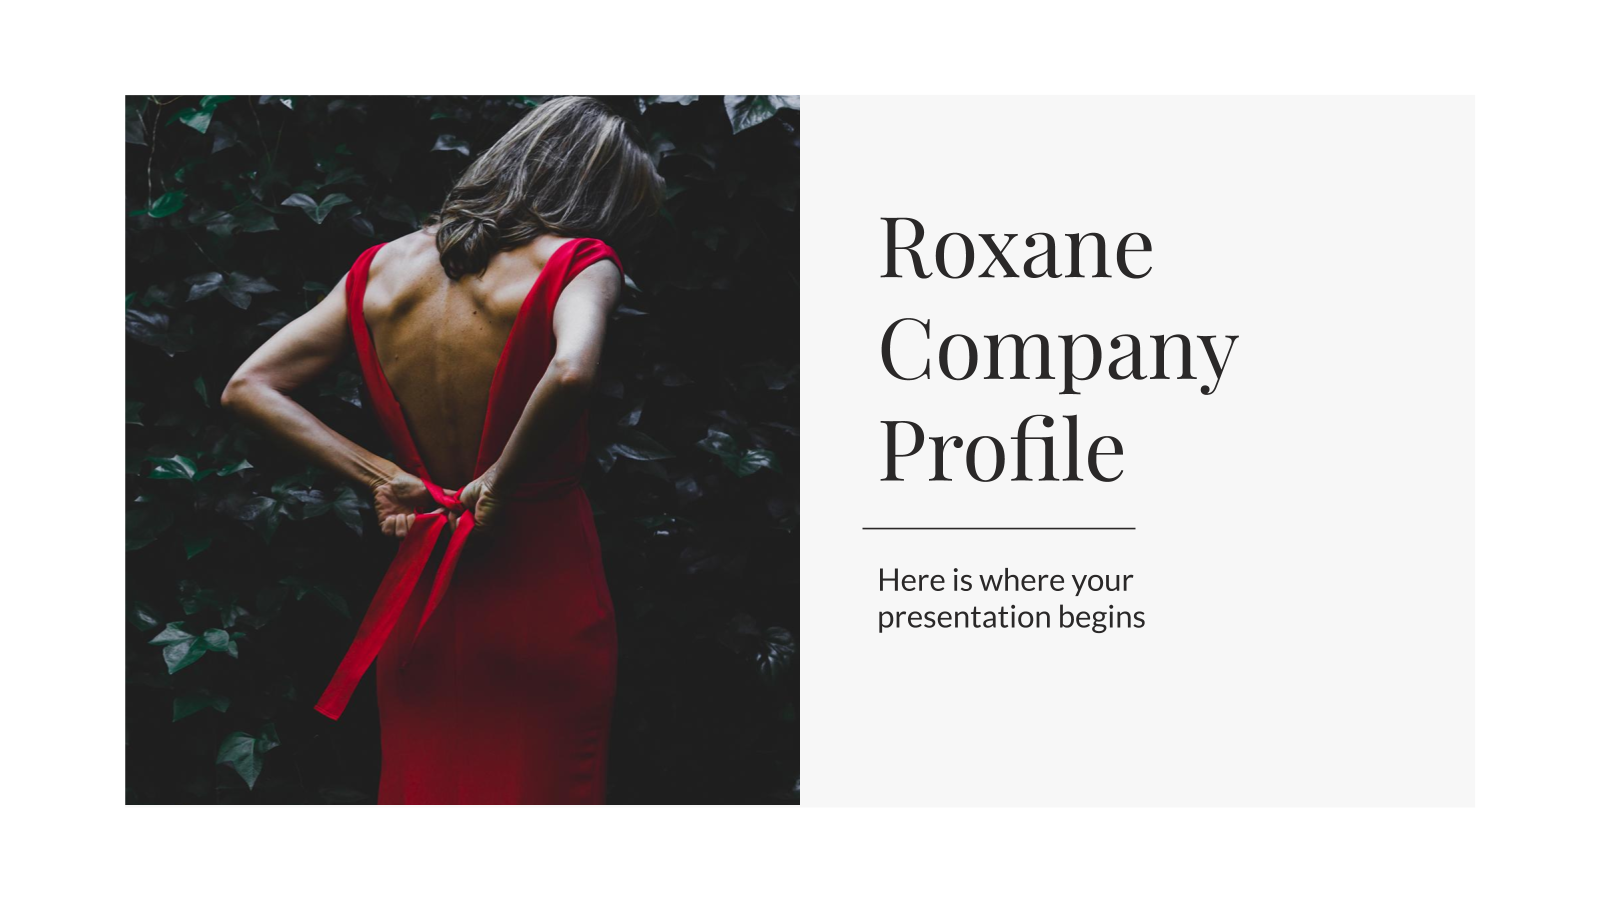 Roxane Company Profile presentation template